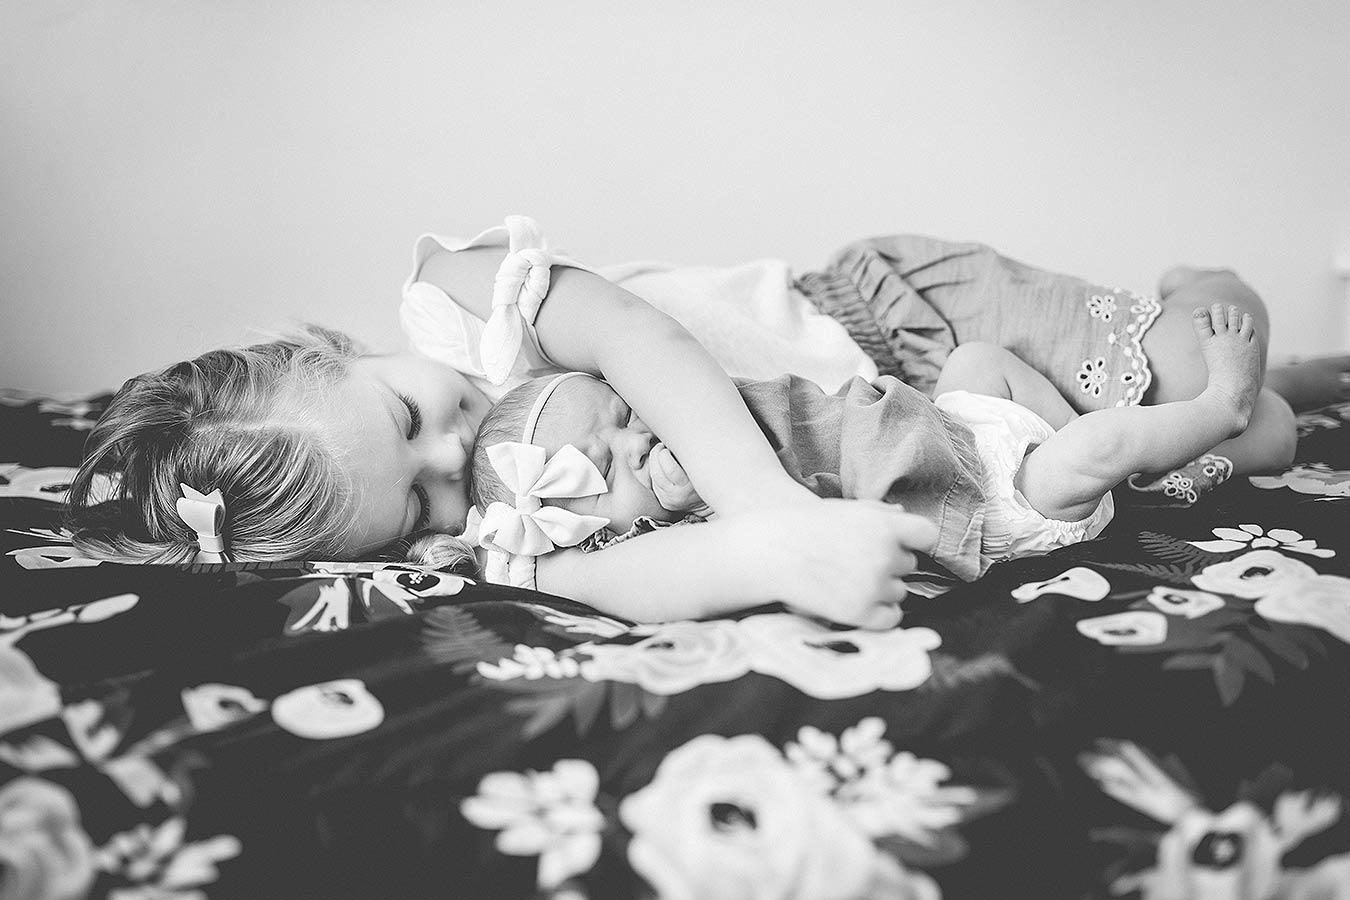 LoganUtahNewbornPhotographer-LifestyleNewbornPhotographyUtah-HeidiRandallStudios-Ellie-GirlNewbornPhotos-5.jpg